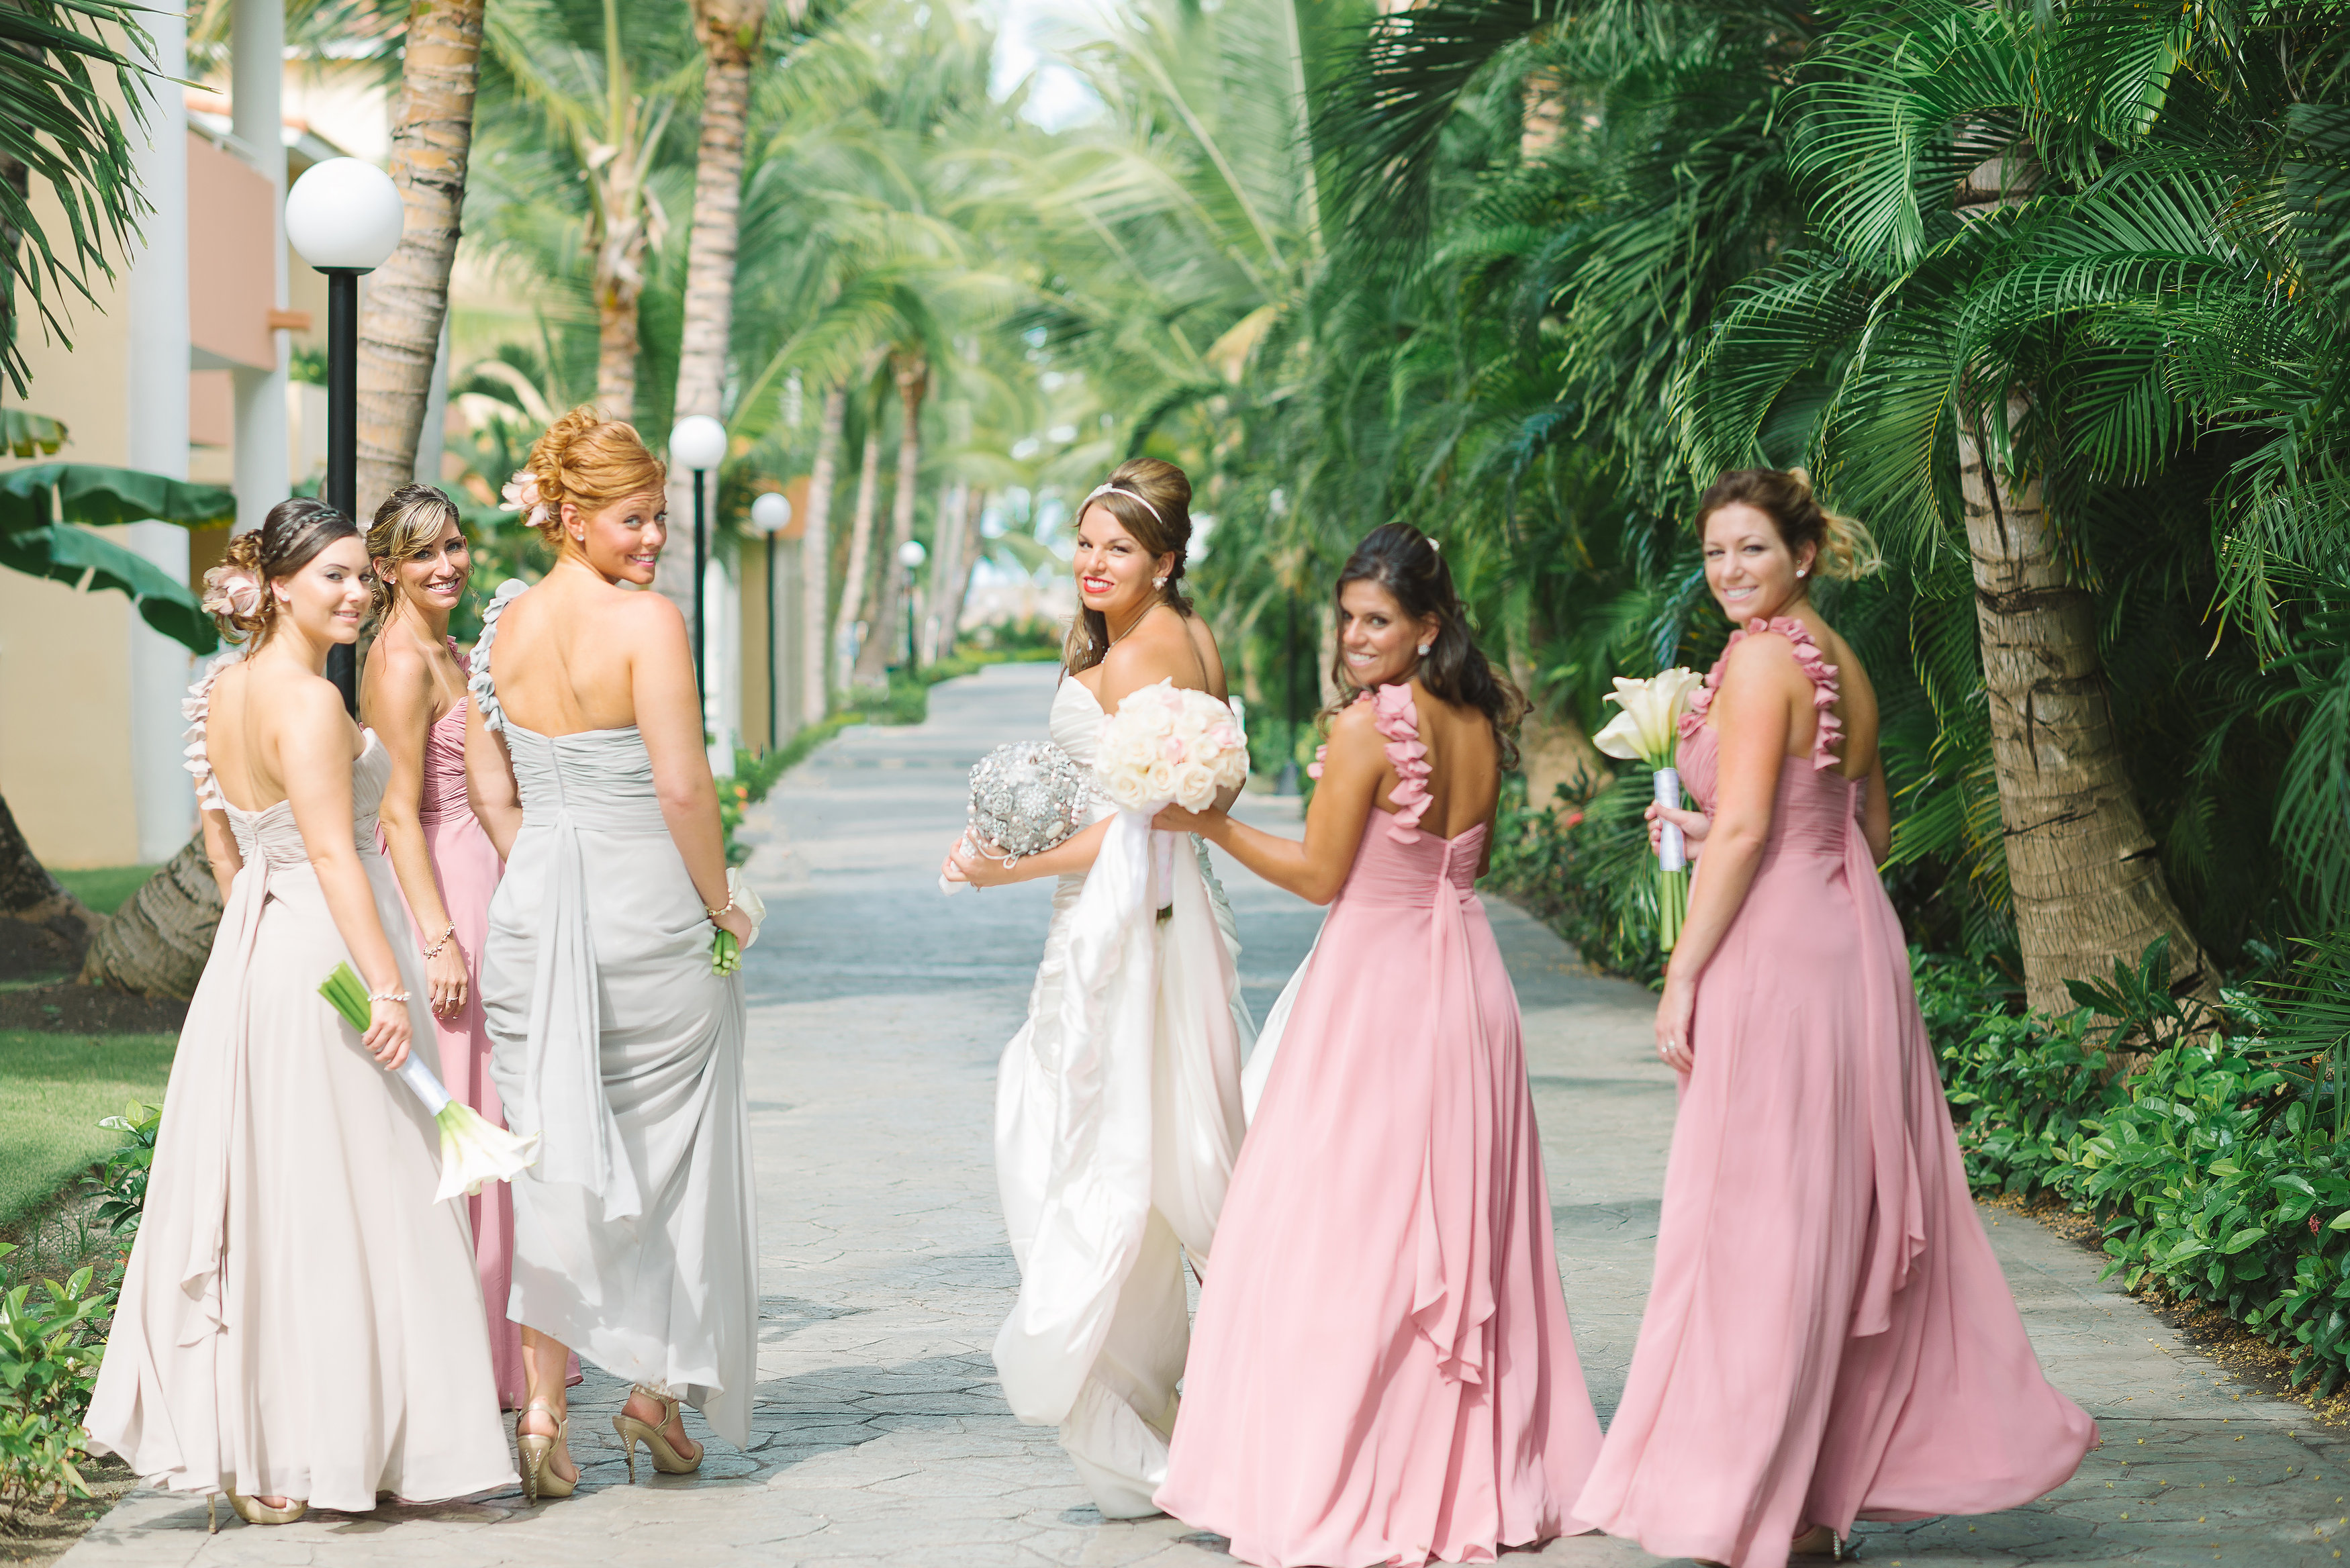 vardy-prevost-wedding-211